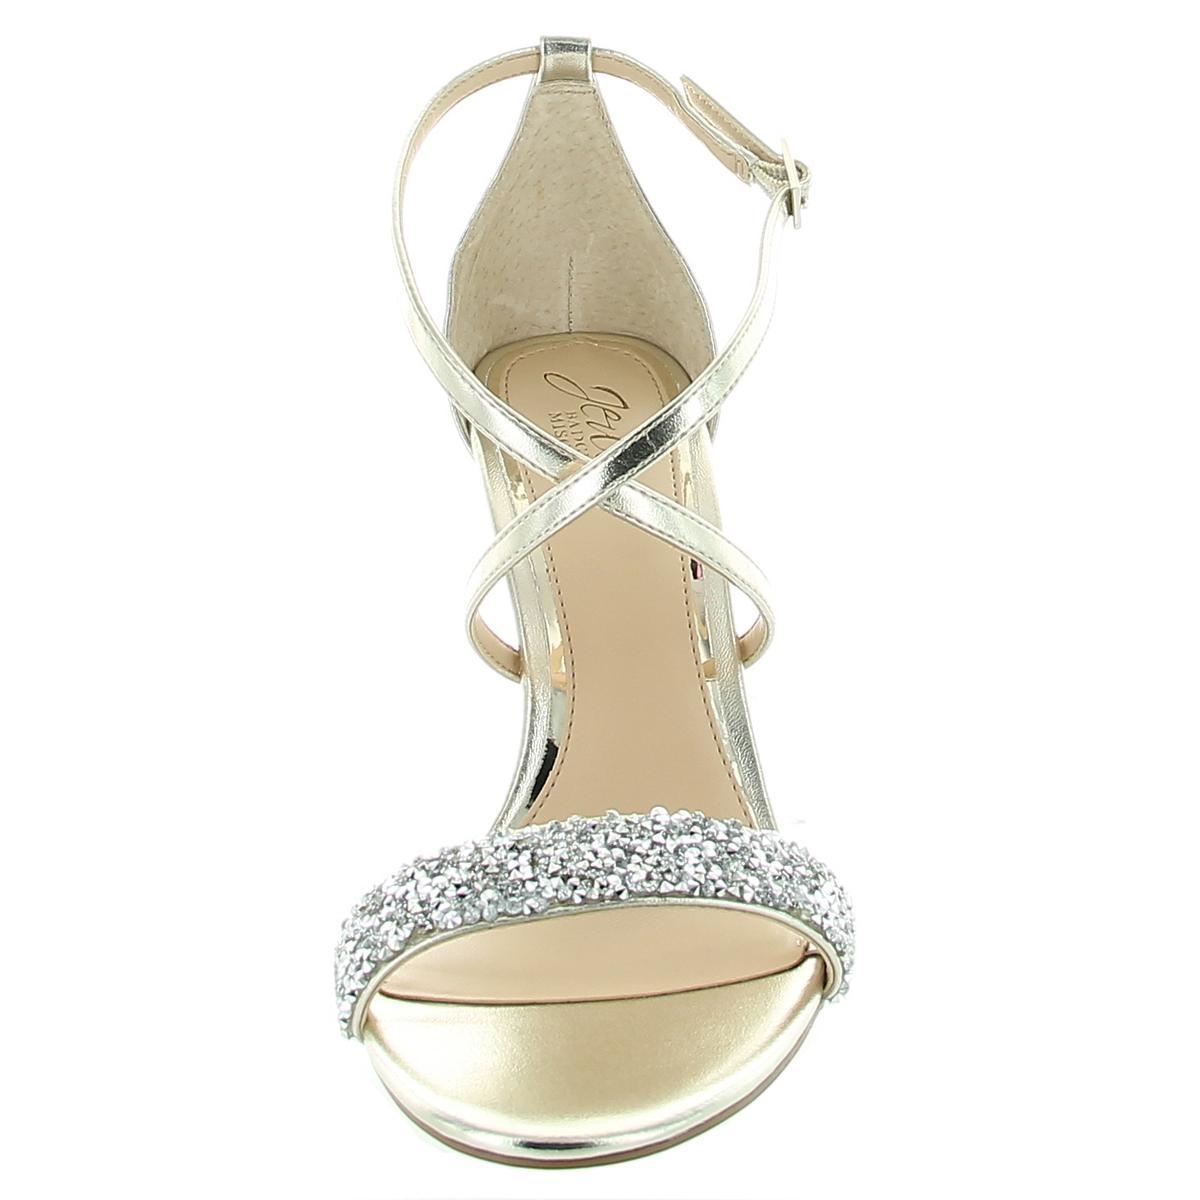 thumbnail 5 - Jewel Badgley Mischka Womens NANNA Ankle Strap Open Toe Pumps Shoes BHFO 1037